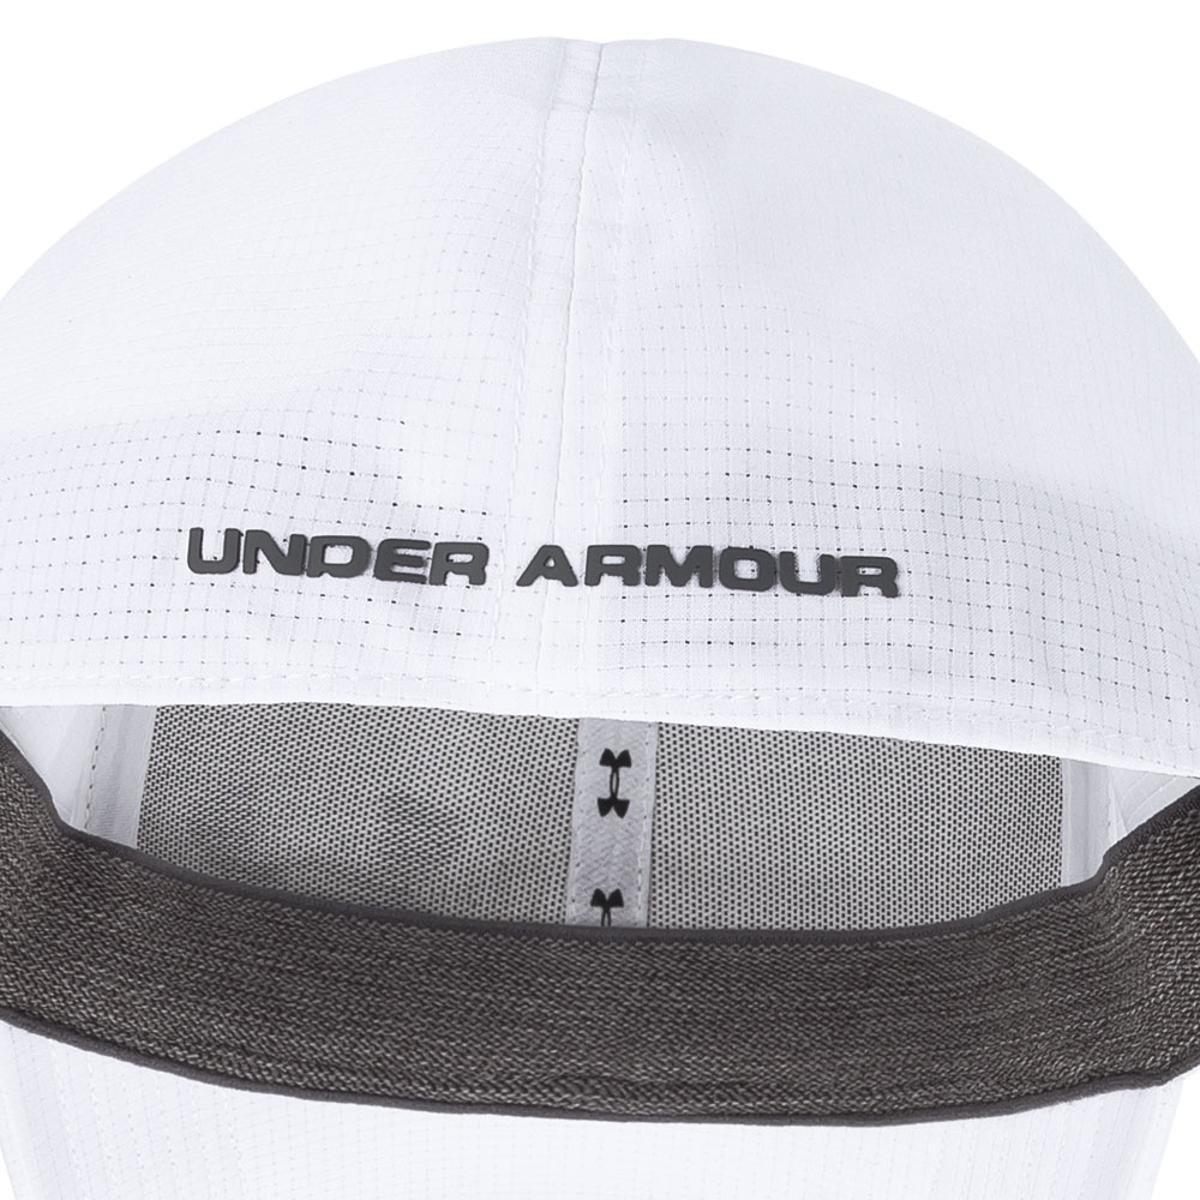 Boné Under Armour Airvent Core Masculino - Compre Agora  63e78f86d37c7